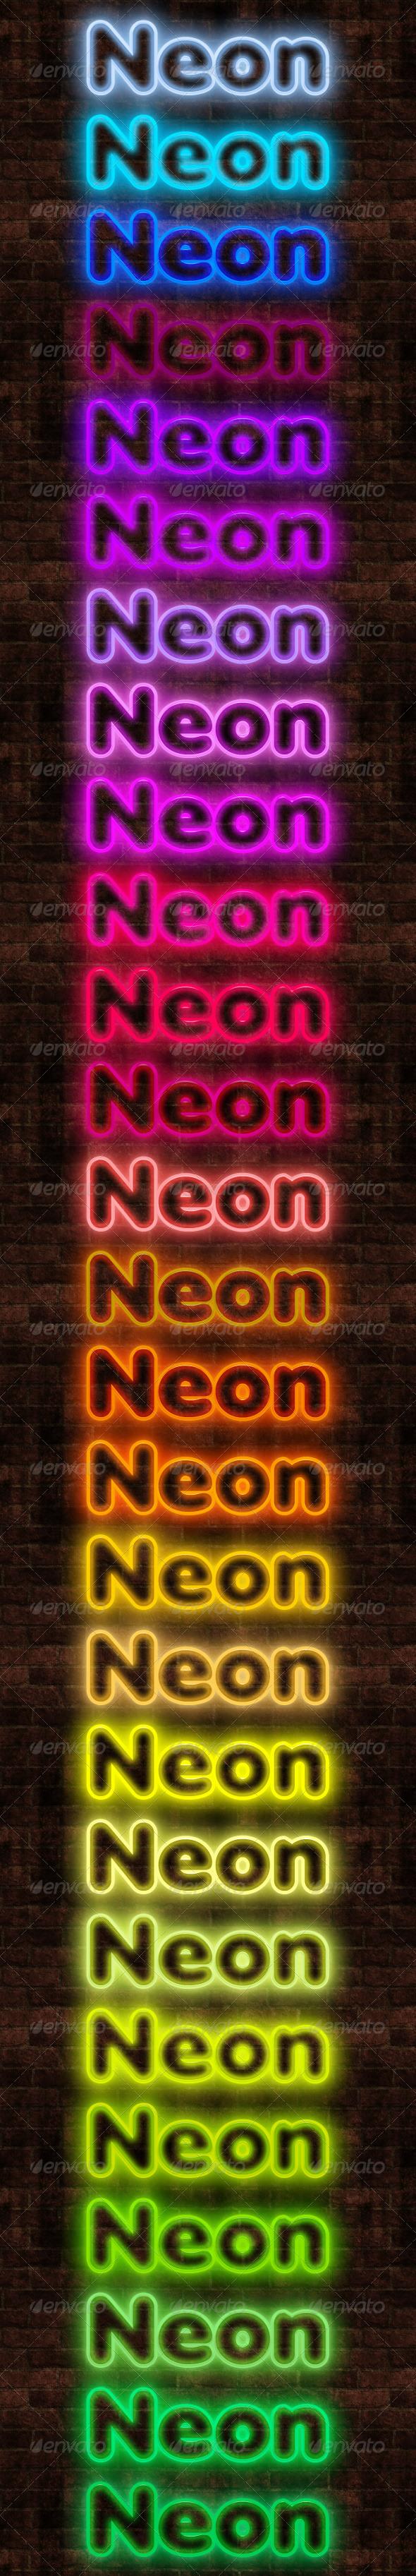 GraphicRiver 27 Neon Styles 241858